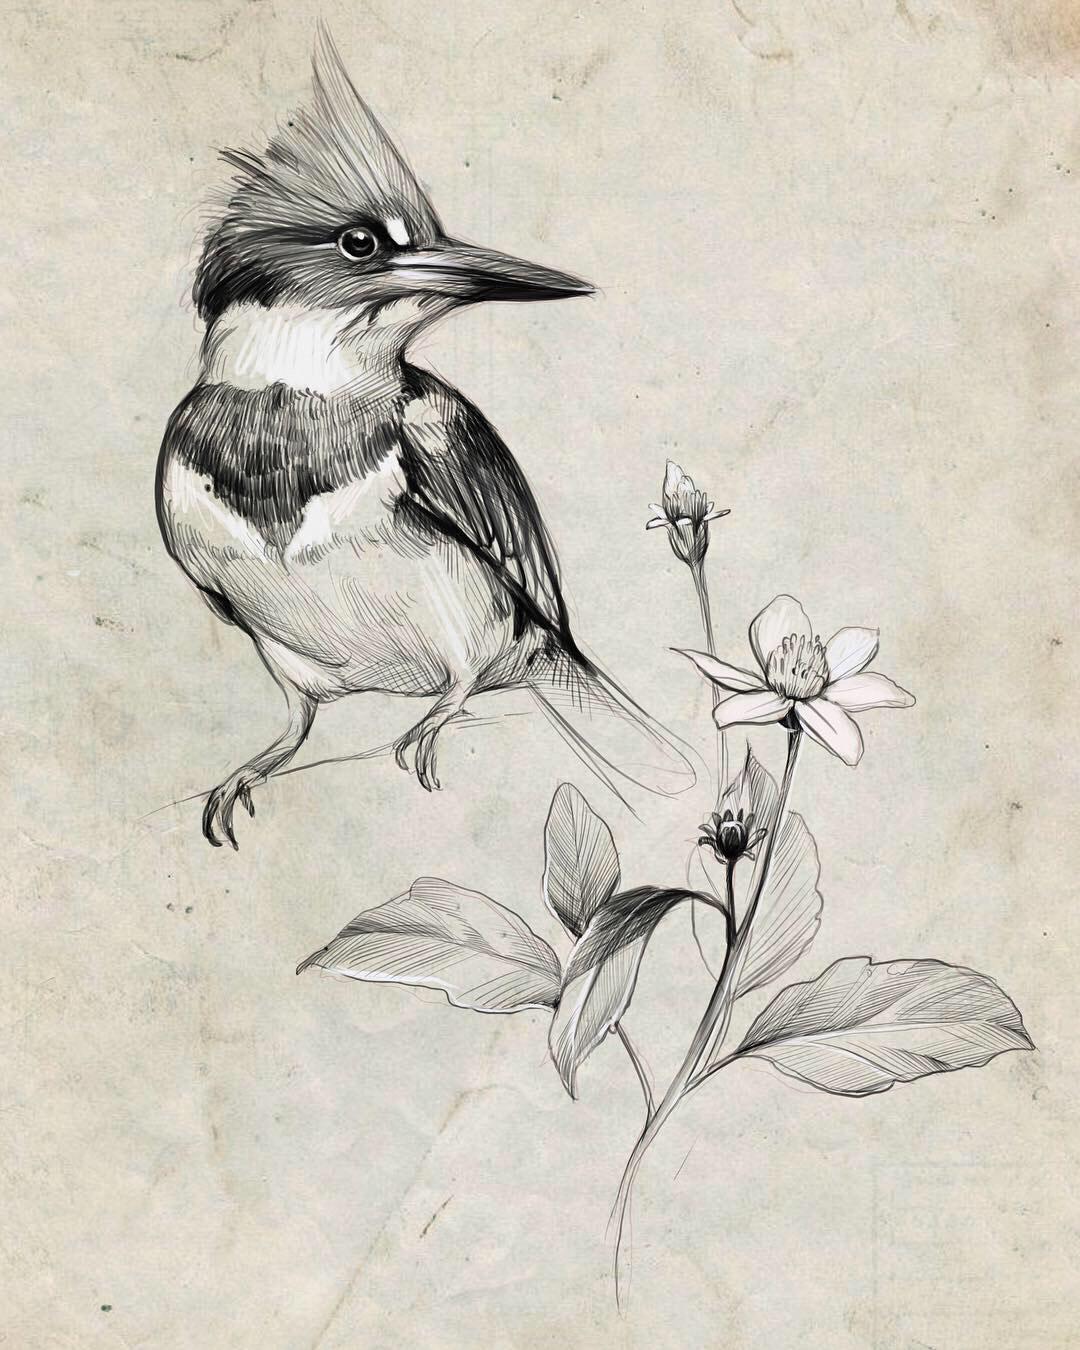 birds Nature sketching sketch pencil Pencil drawing digital drawing process pensil sketch plants tutorial process video video tutorial